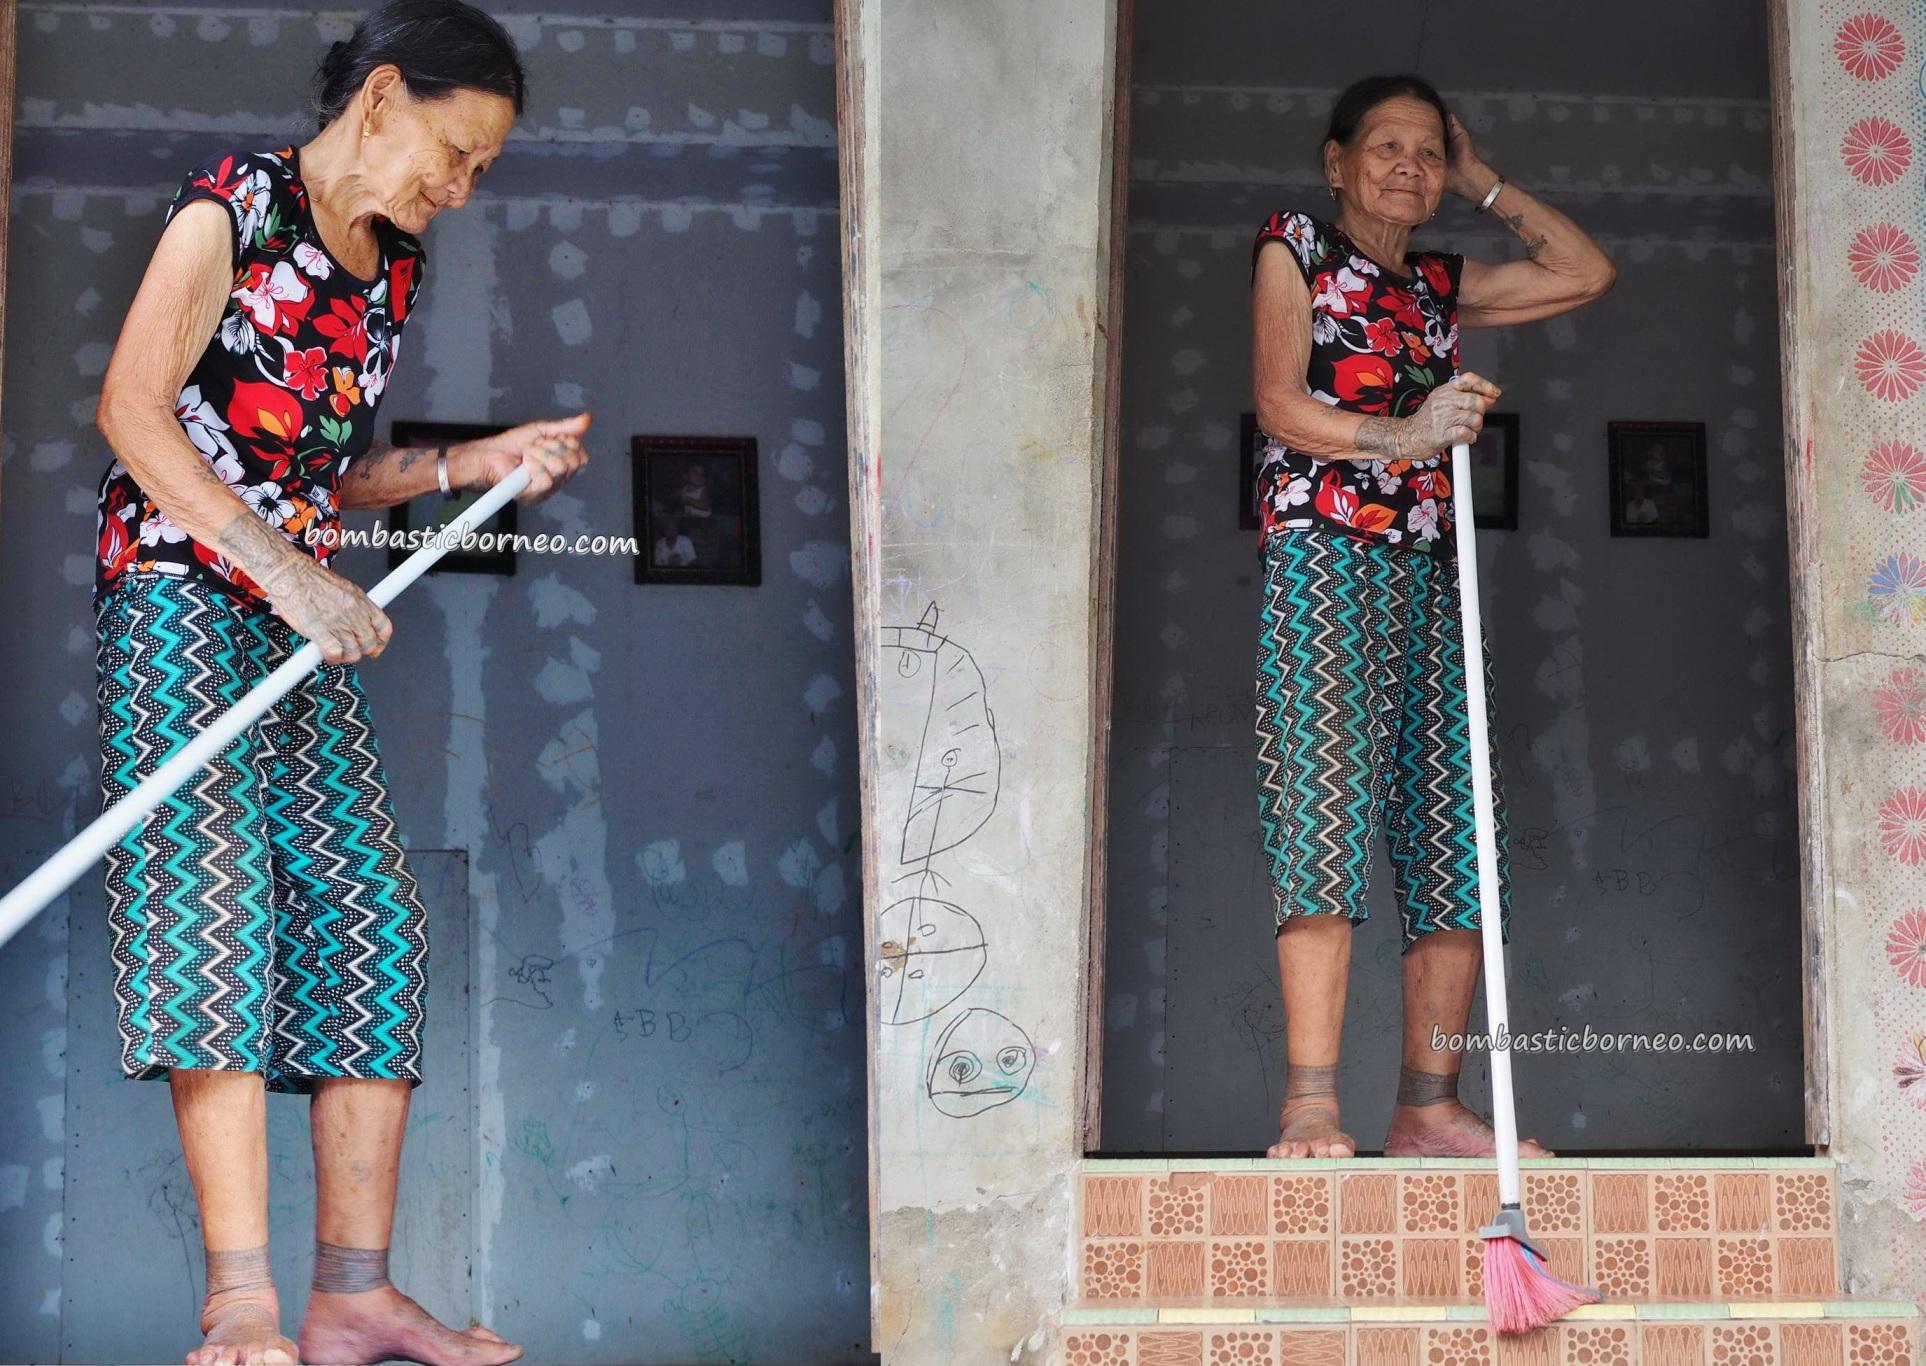 Nanga Lapung, indigenous, traditional, village, Borneo, Indonesia, West Kalimantan, Putussibau Selatan, native, tribe, tribal, Tourism, travel guide. crossborder, 婆罗洲普南族, 原住民部落